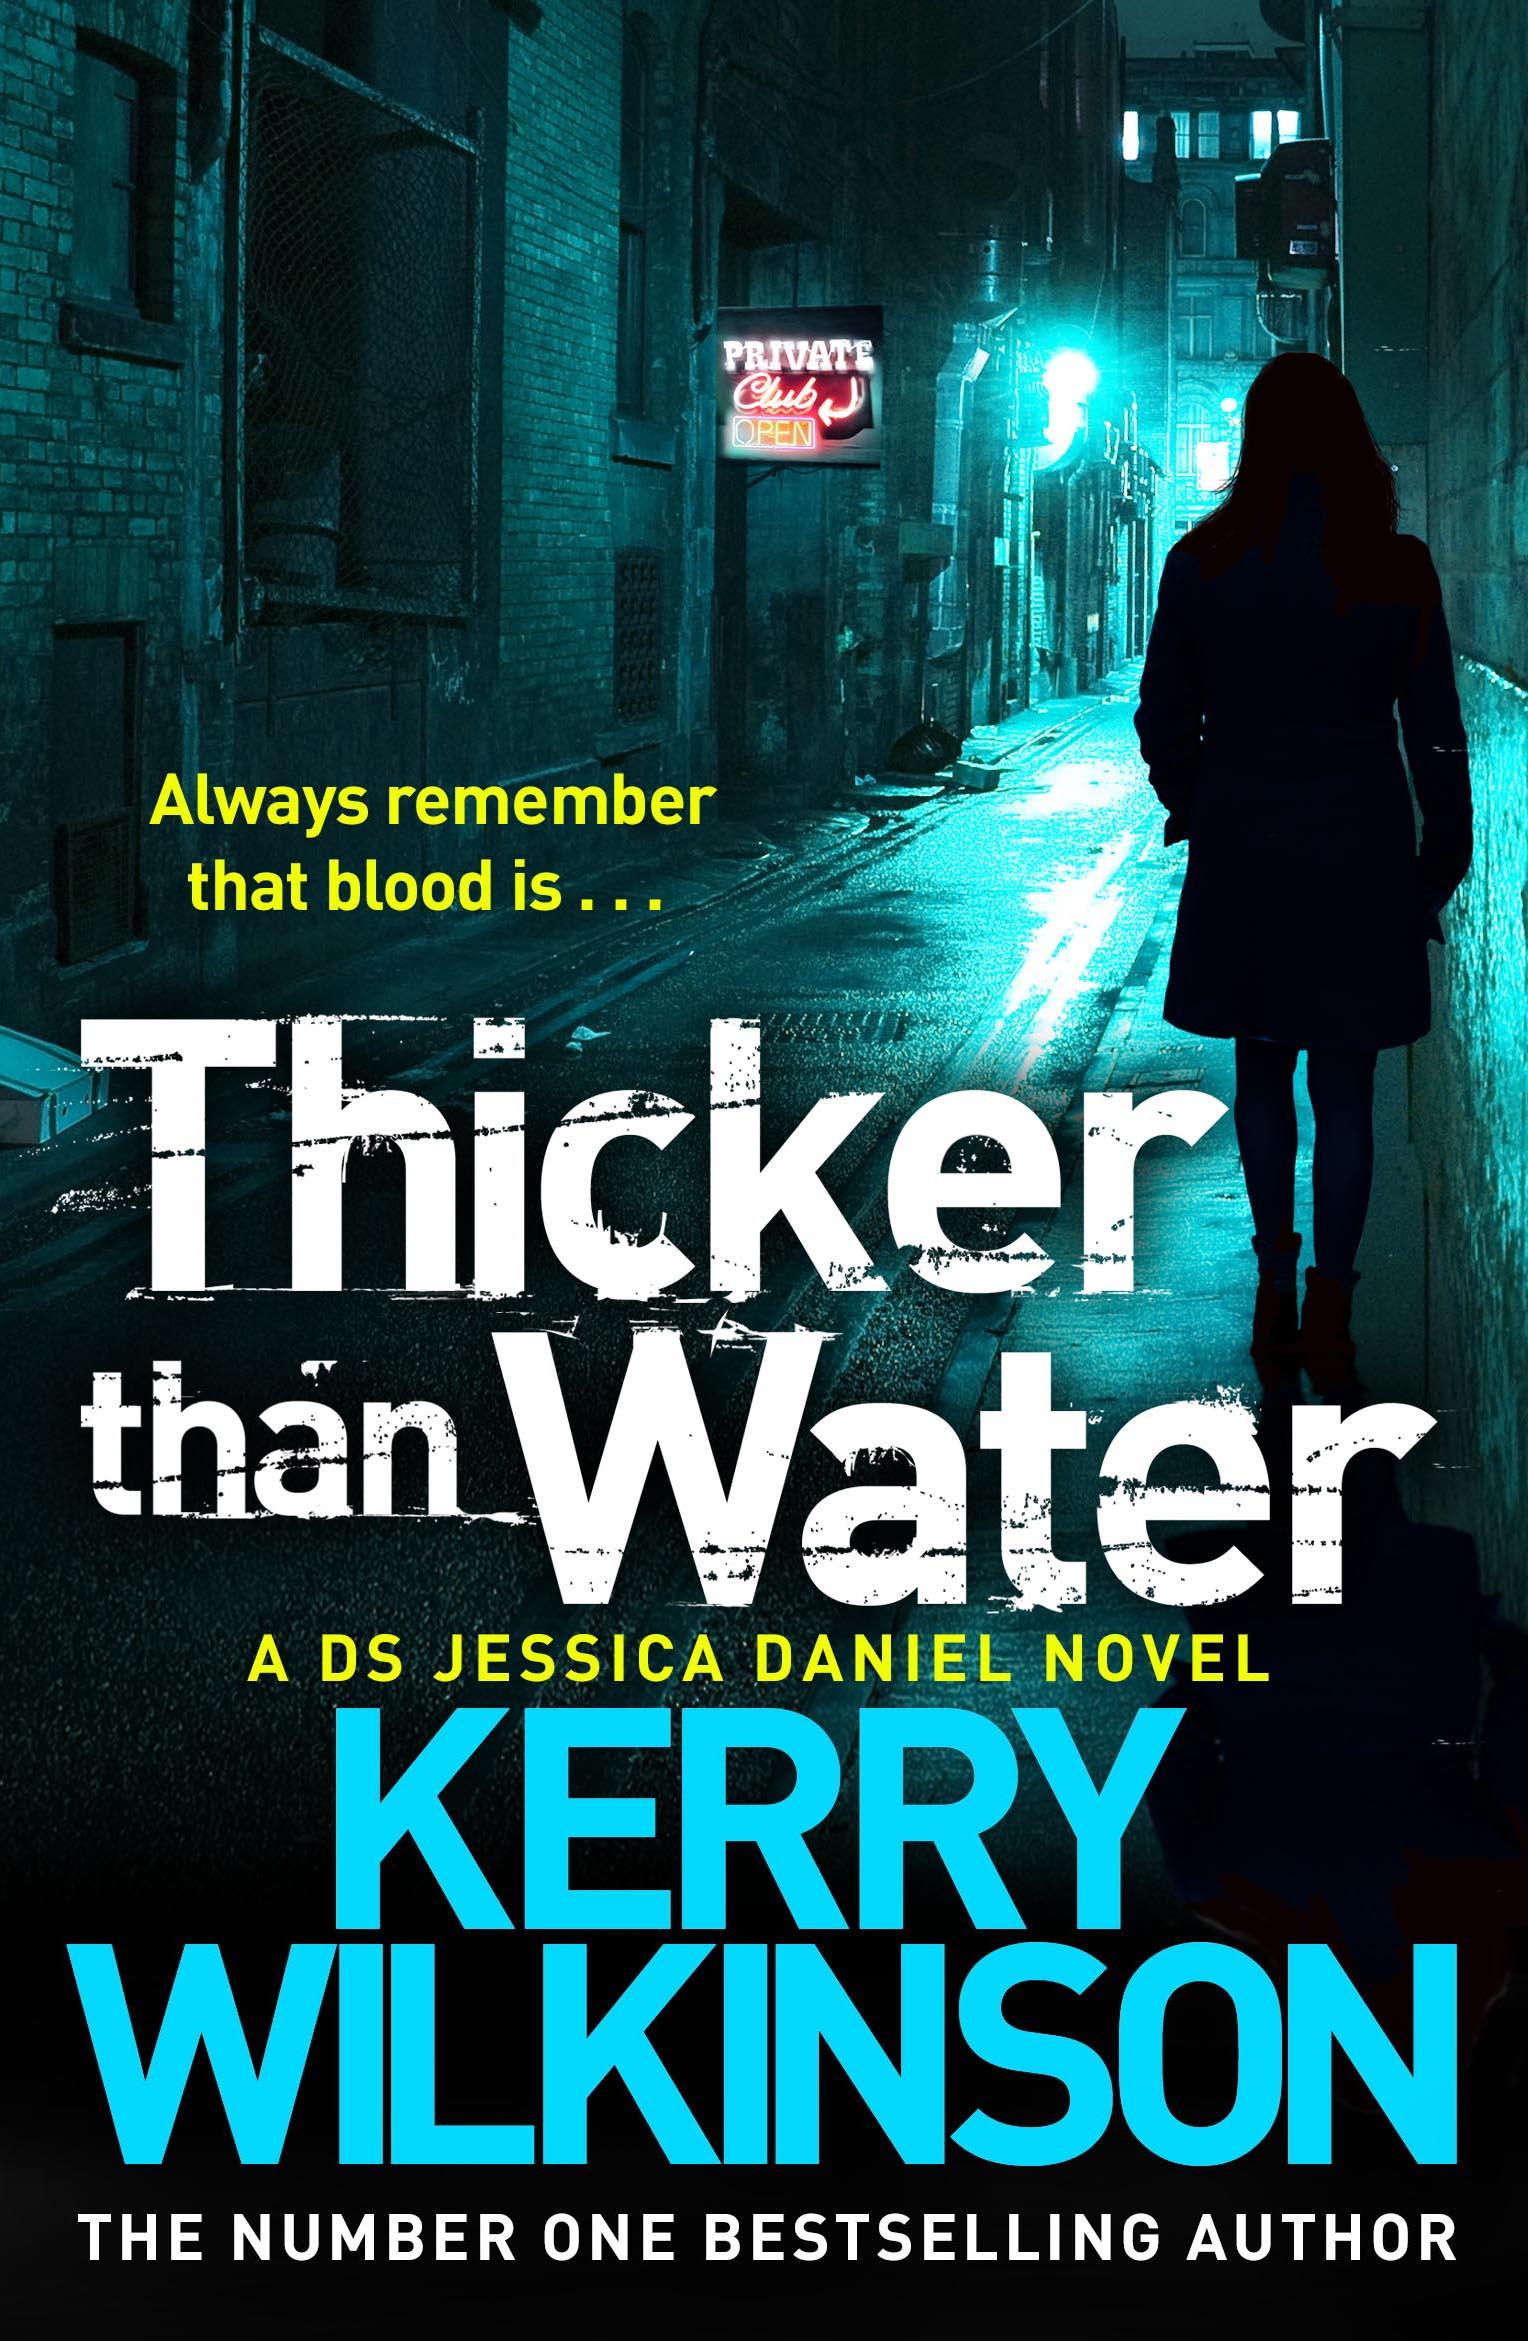 Kerry Wilkinson's Blog - Jessica Daniel, Andrew Hunter ...